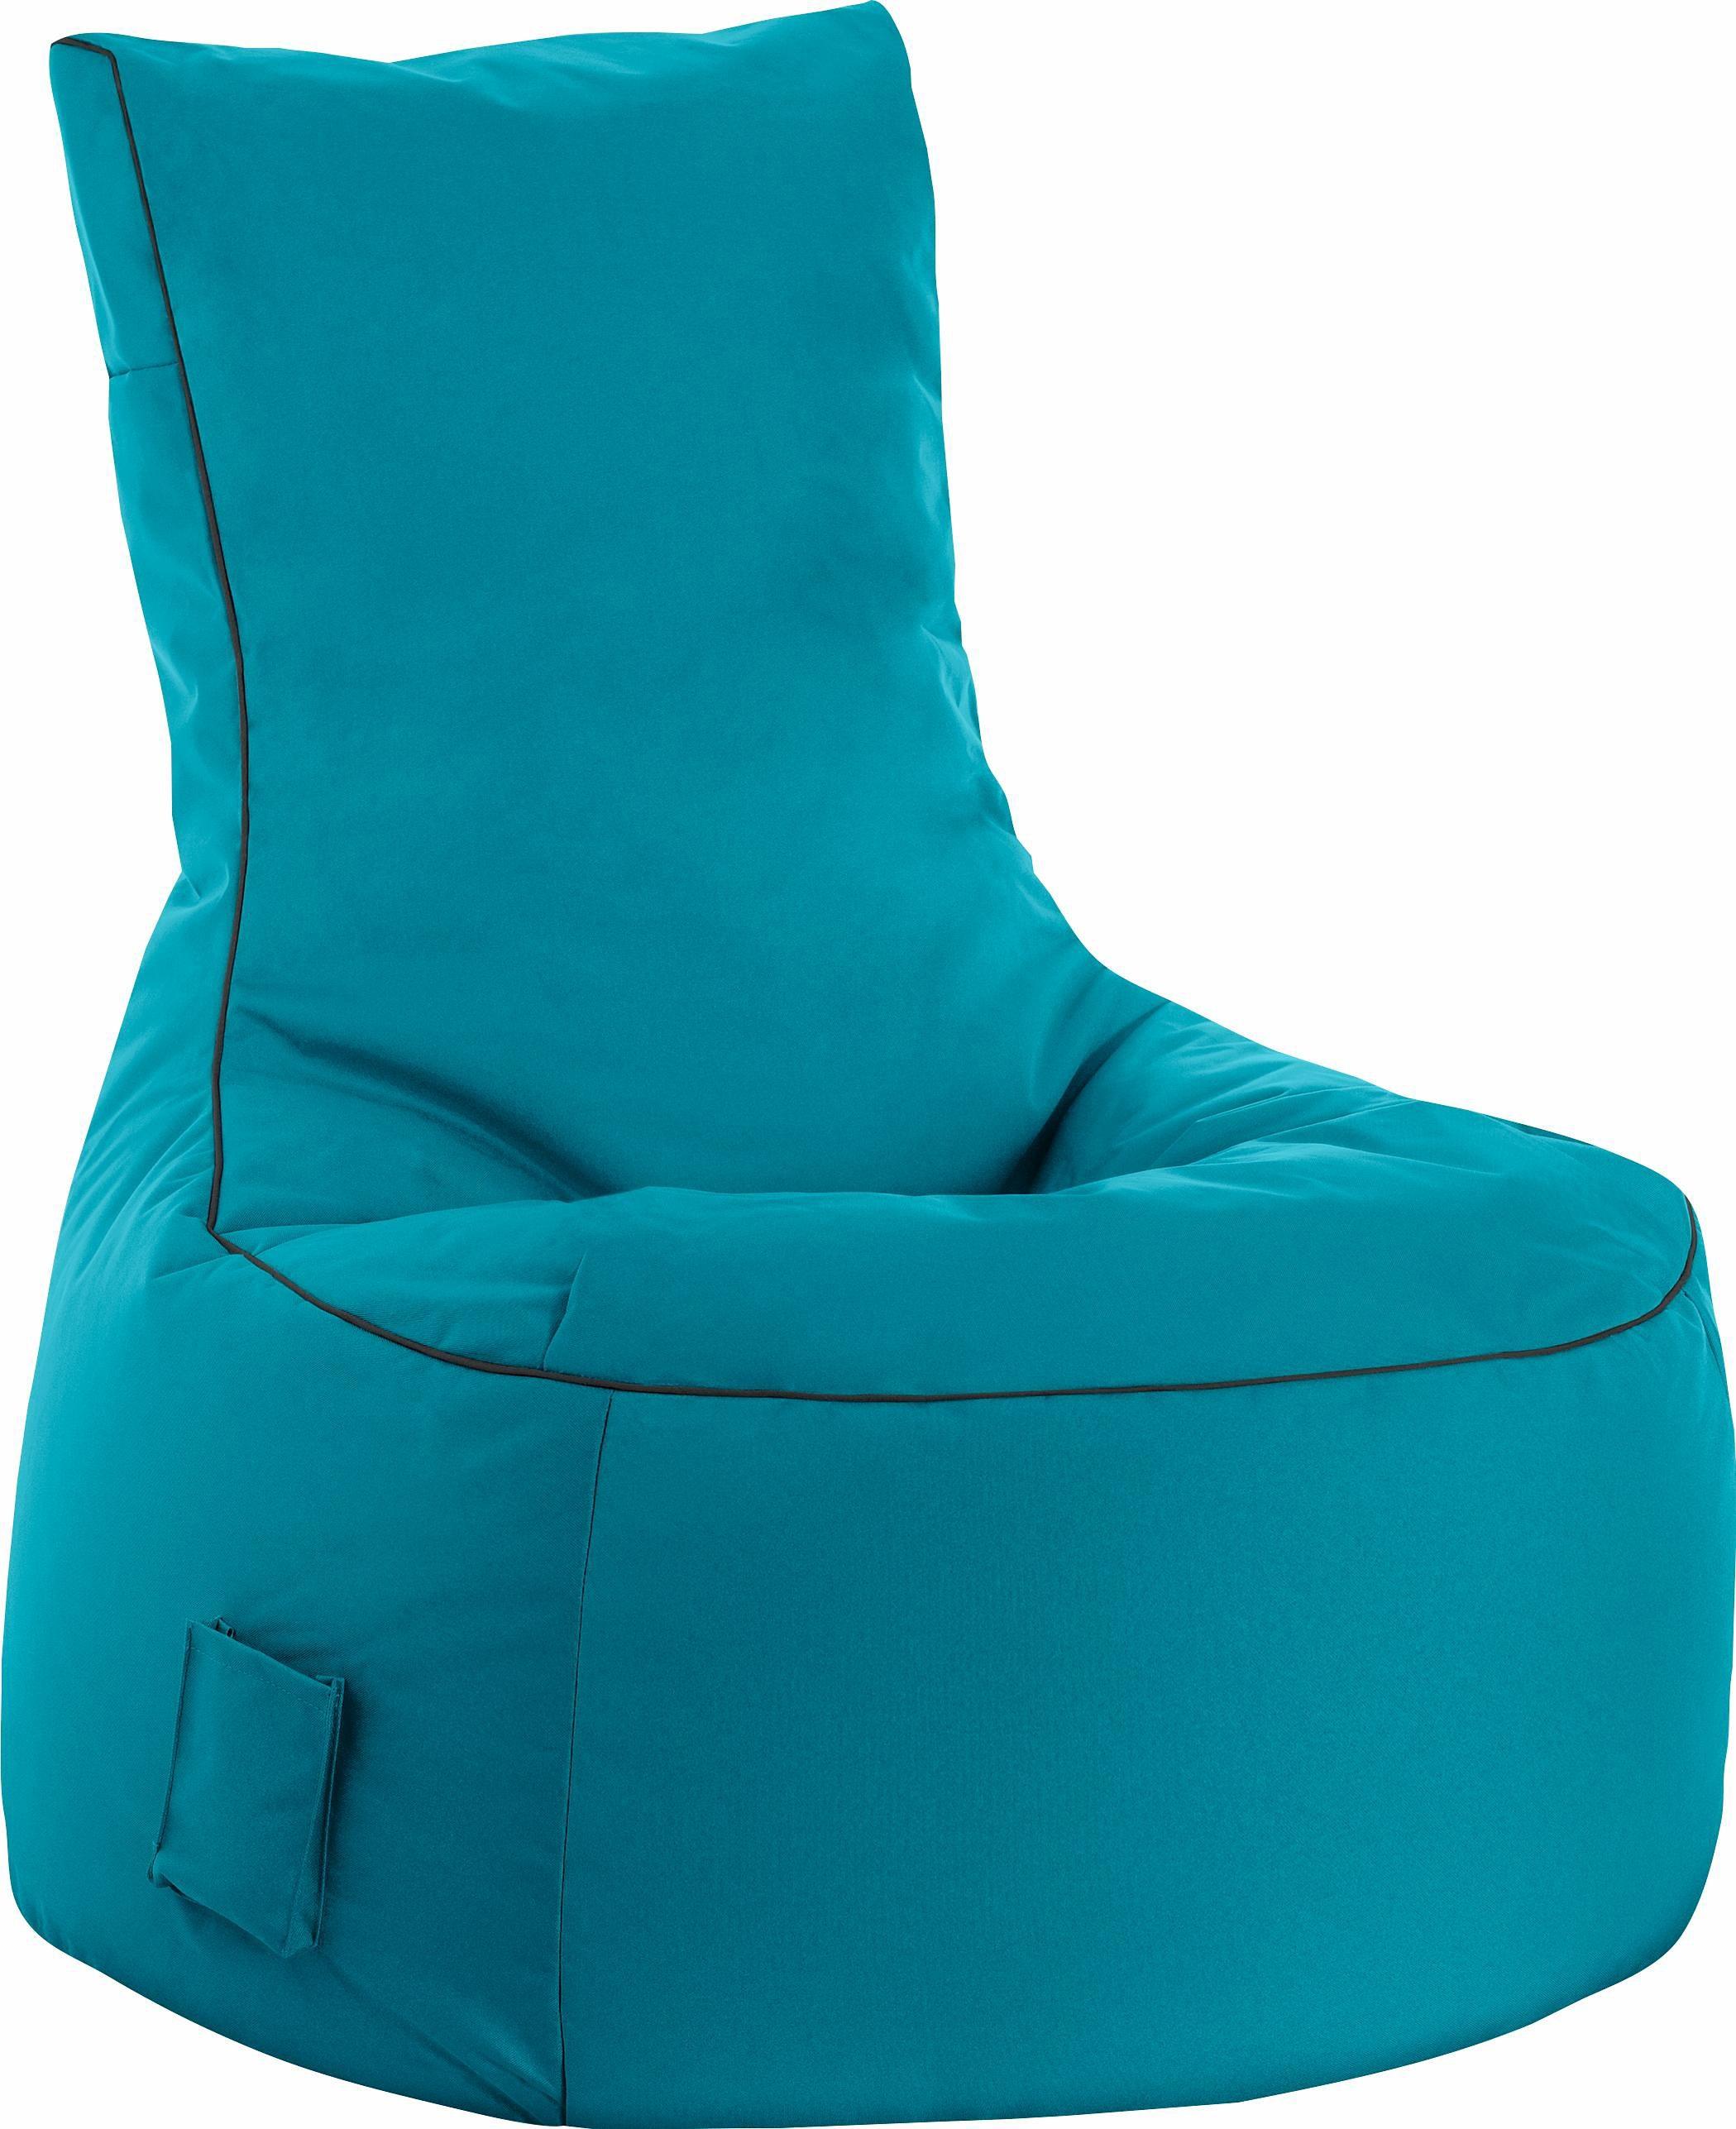 sitting point sitzsack swing scuba auf rechnung baur. Black Bedroom Furniture Sets. Home Design Ideas